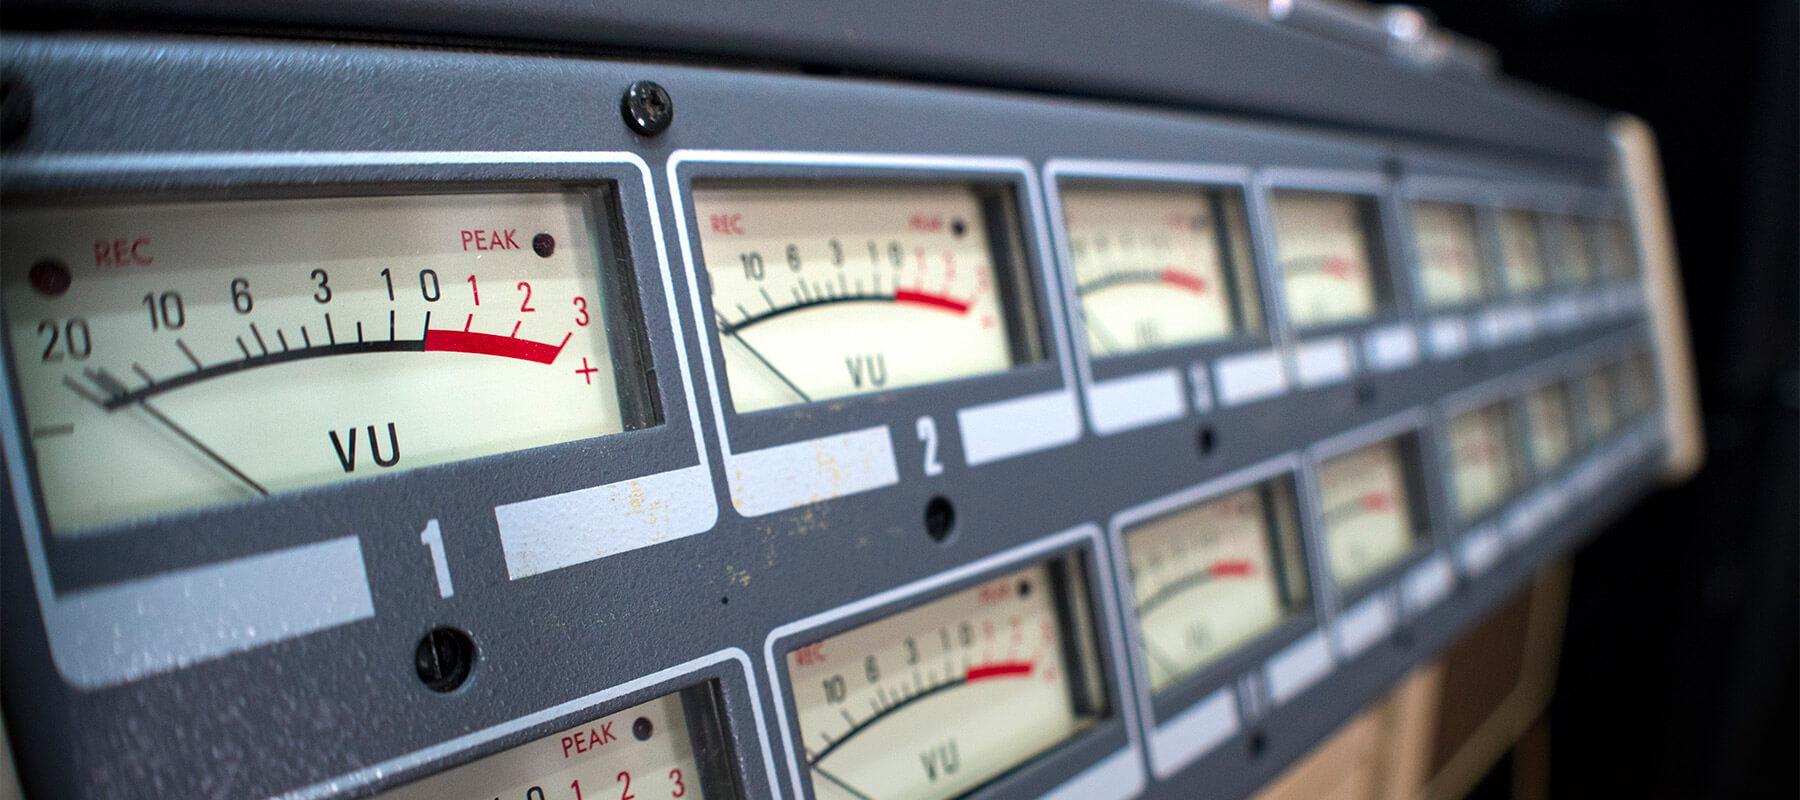 Studio 101 - Audio and Video Recording Studio